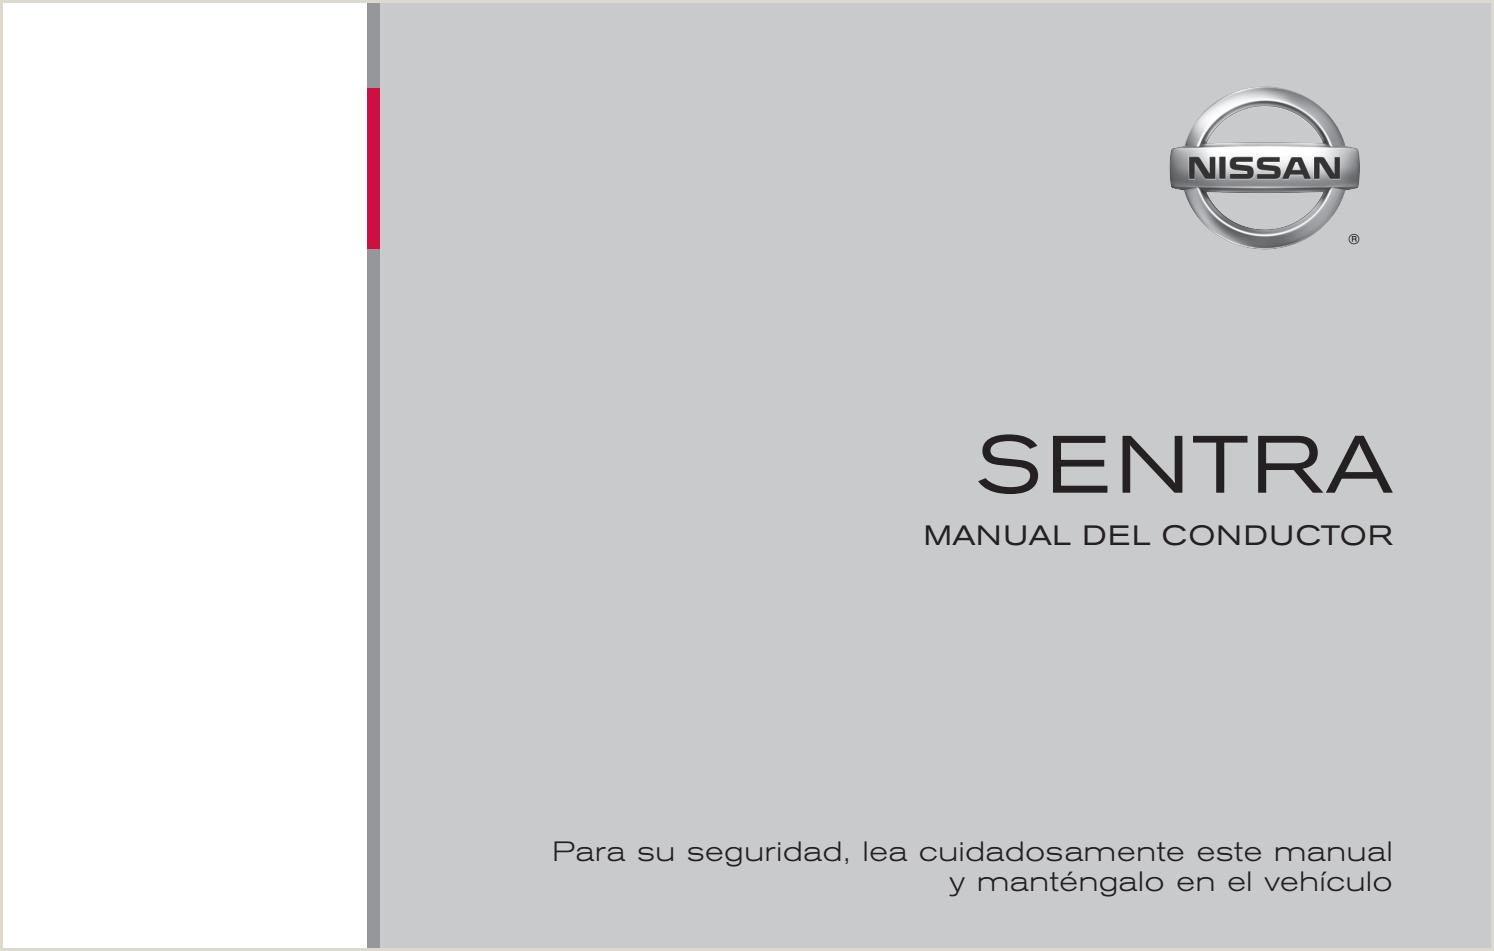 Manual De Usuario Nissan Sentra Mod 2008 by Mauros2000 issuu